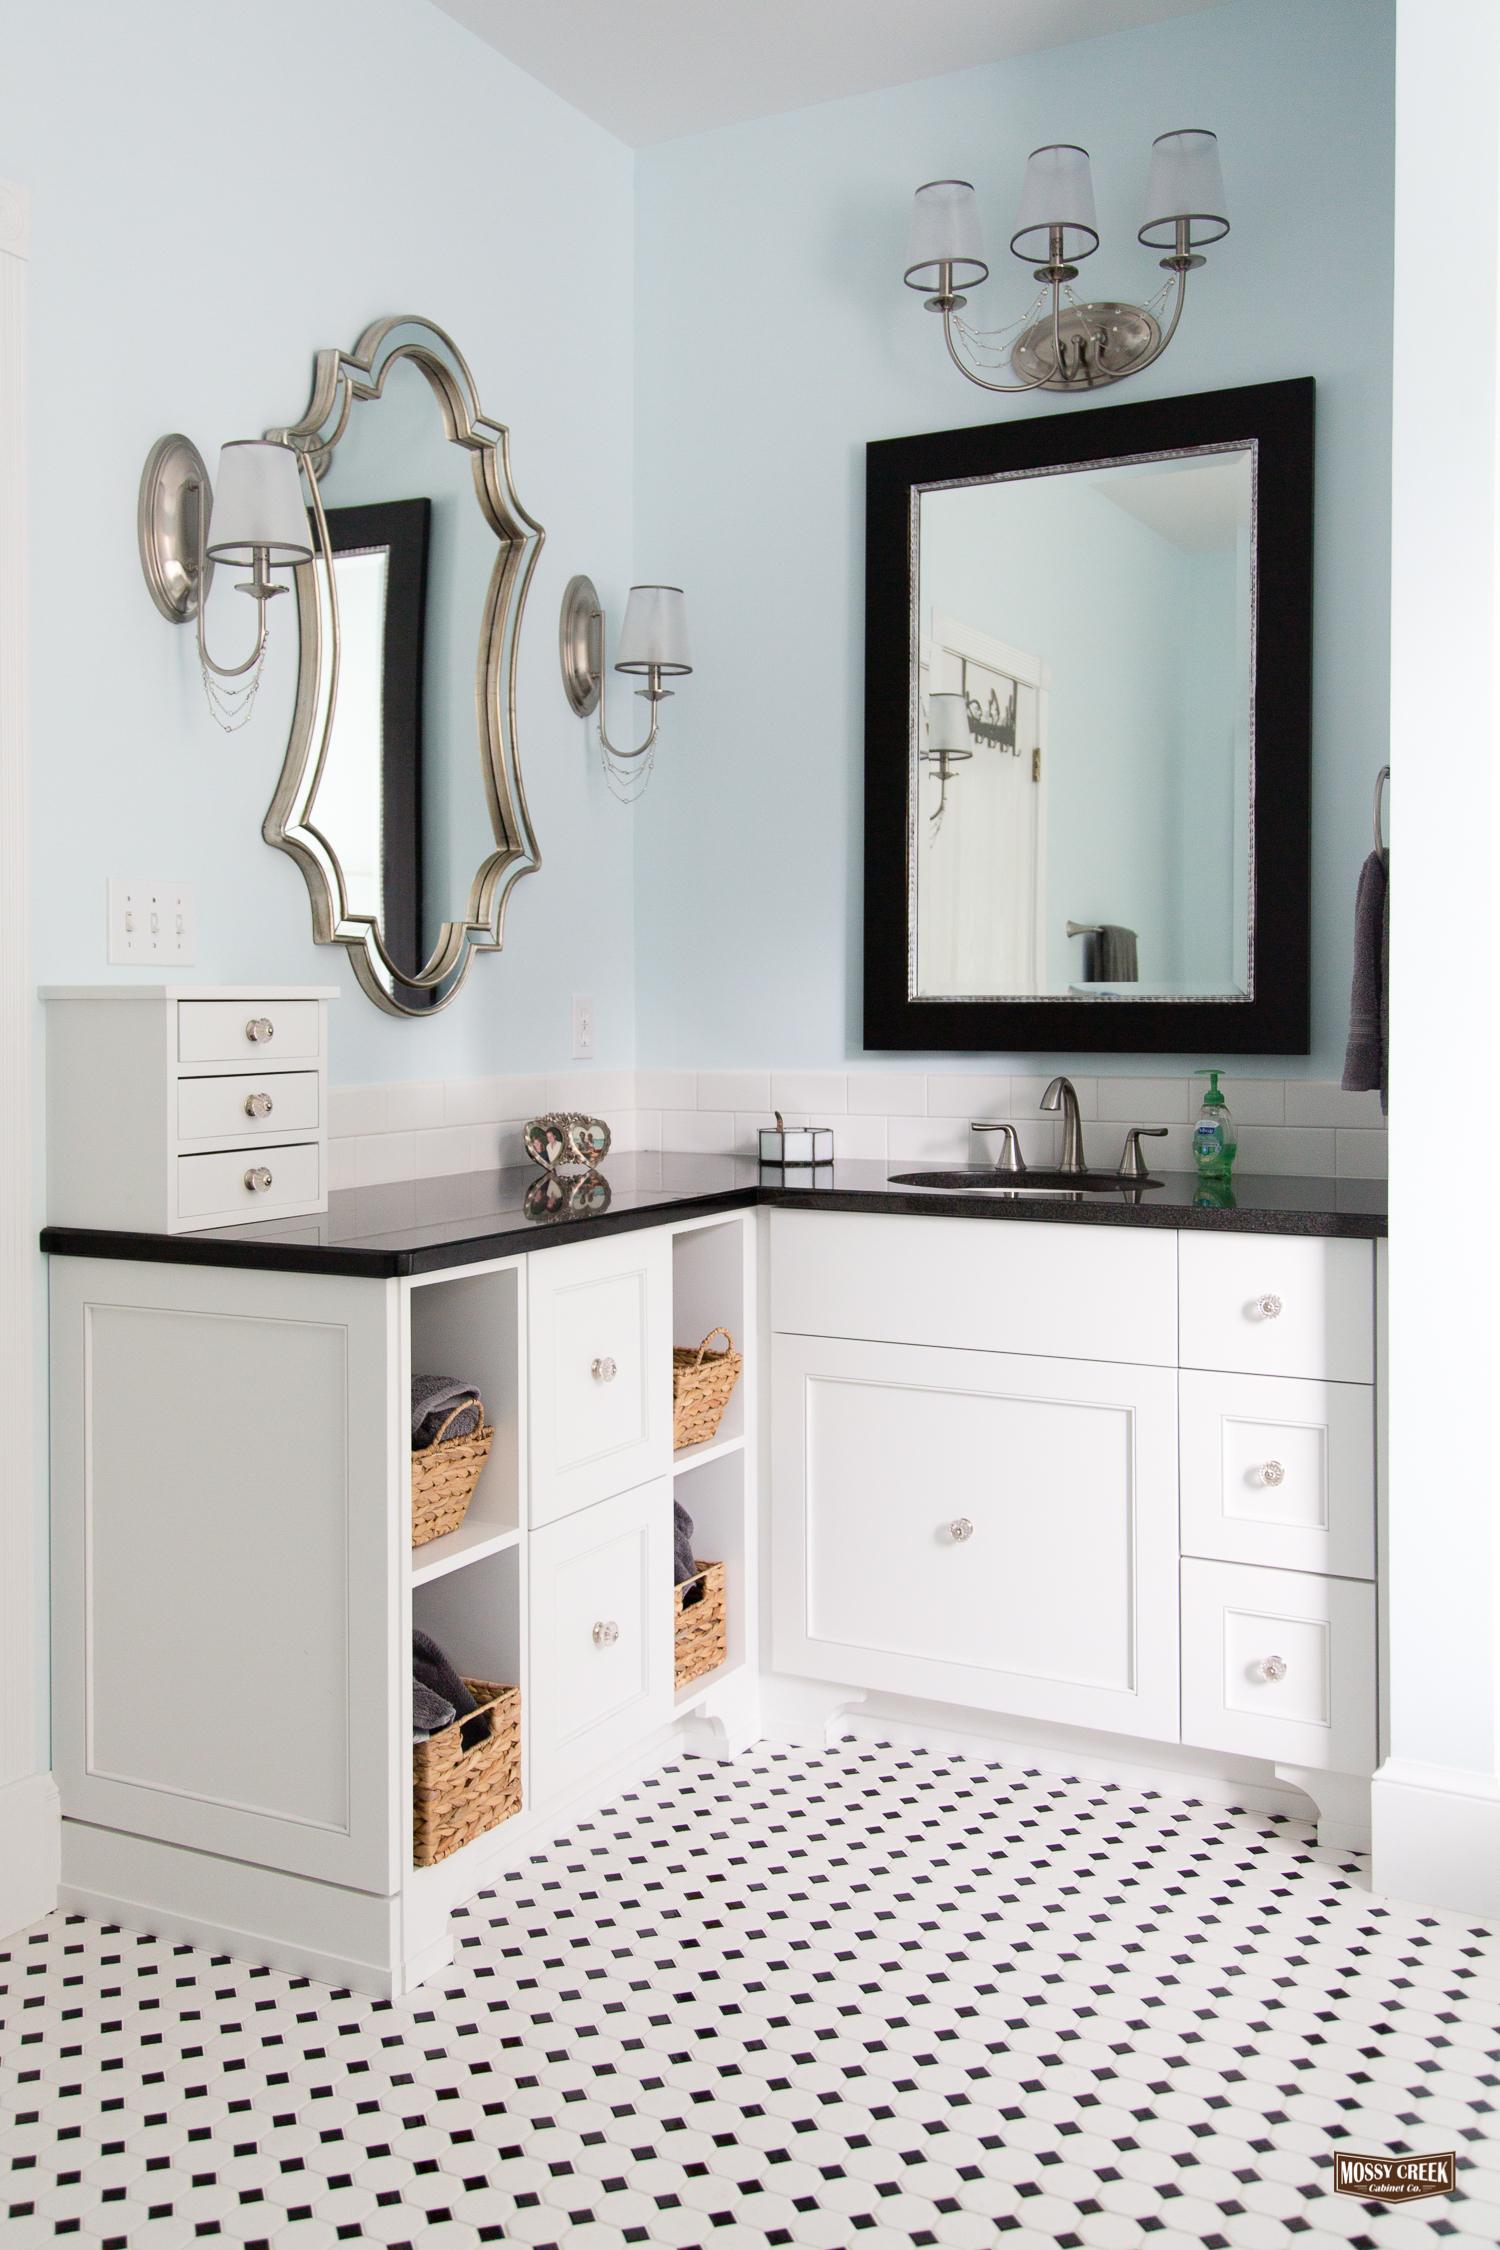 Custom Cabinetry, kitchens, bath vanities